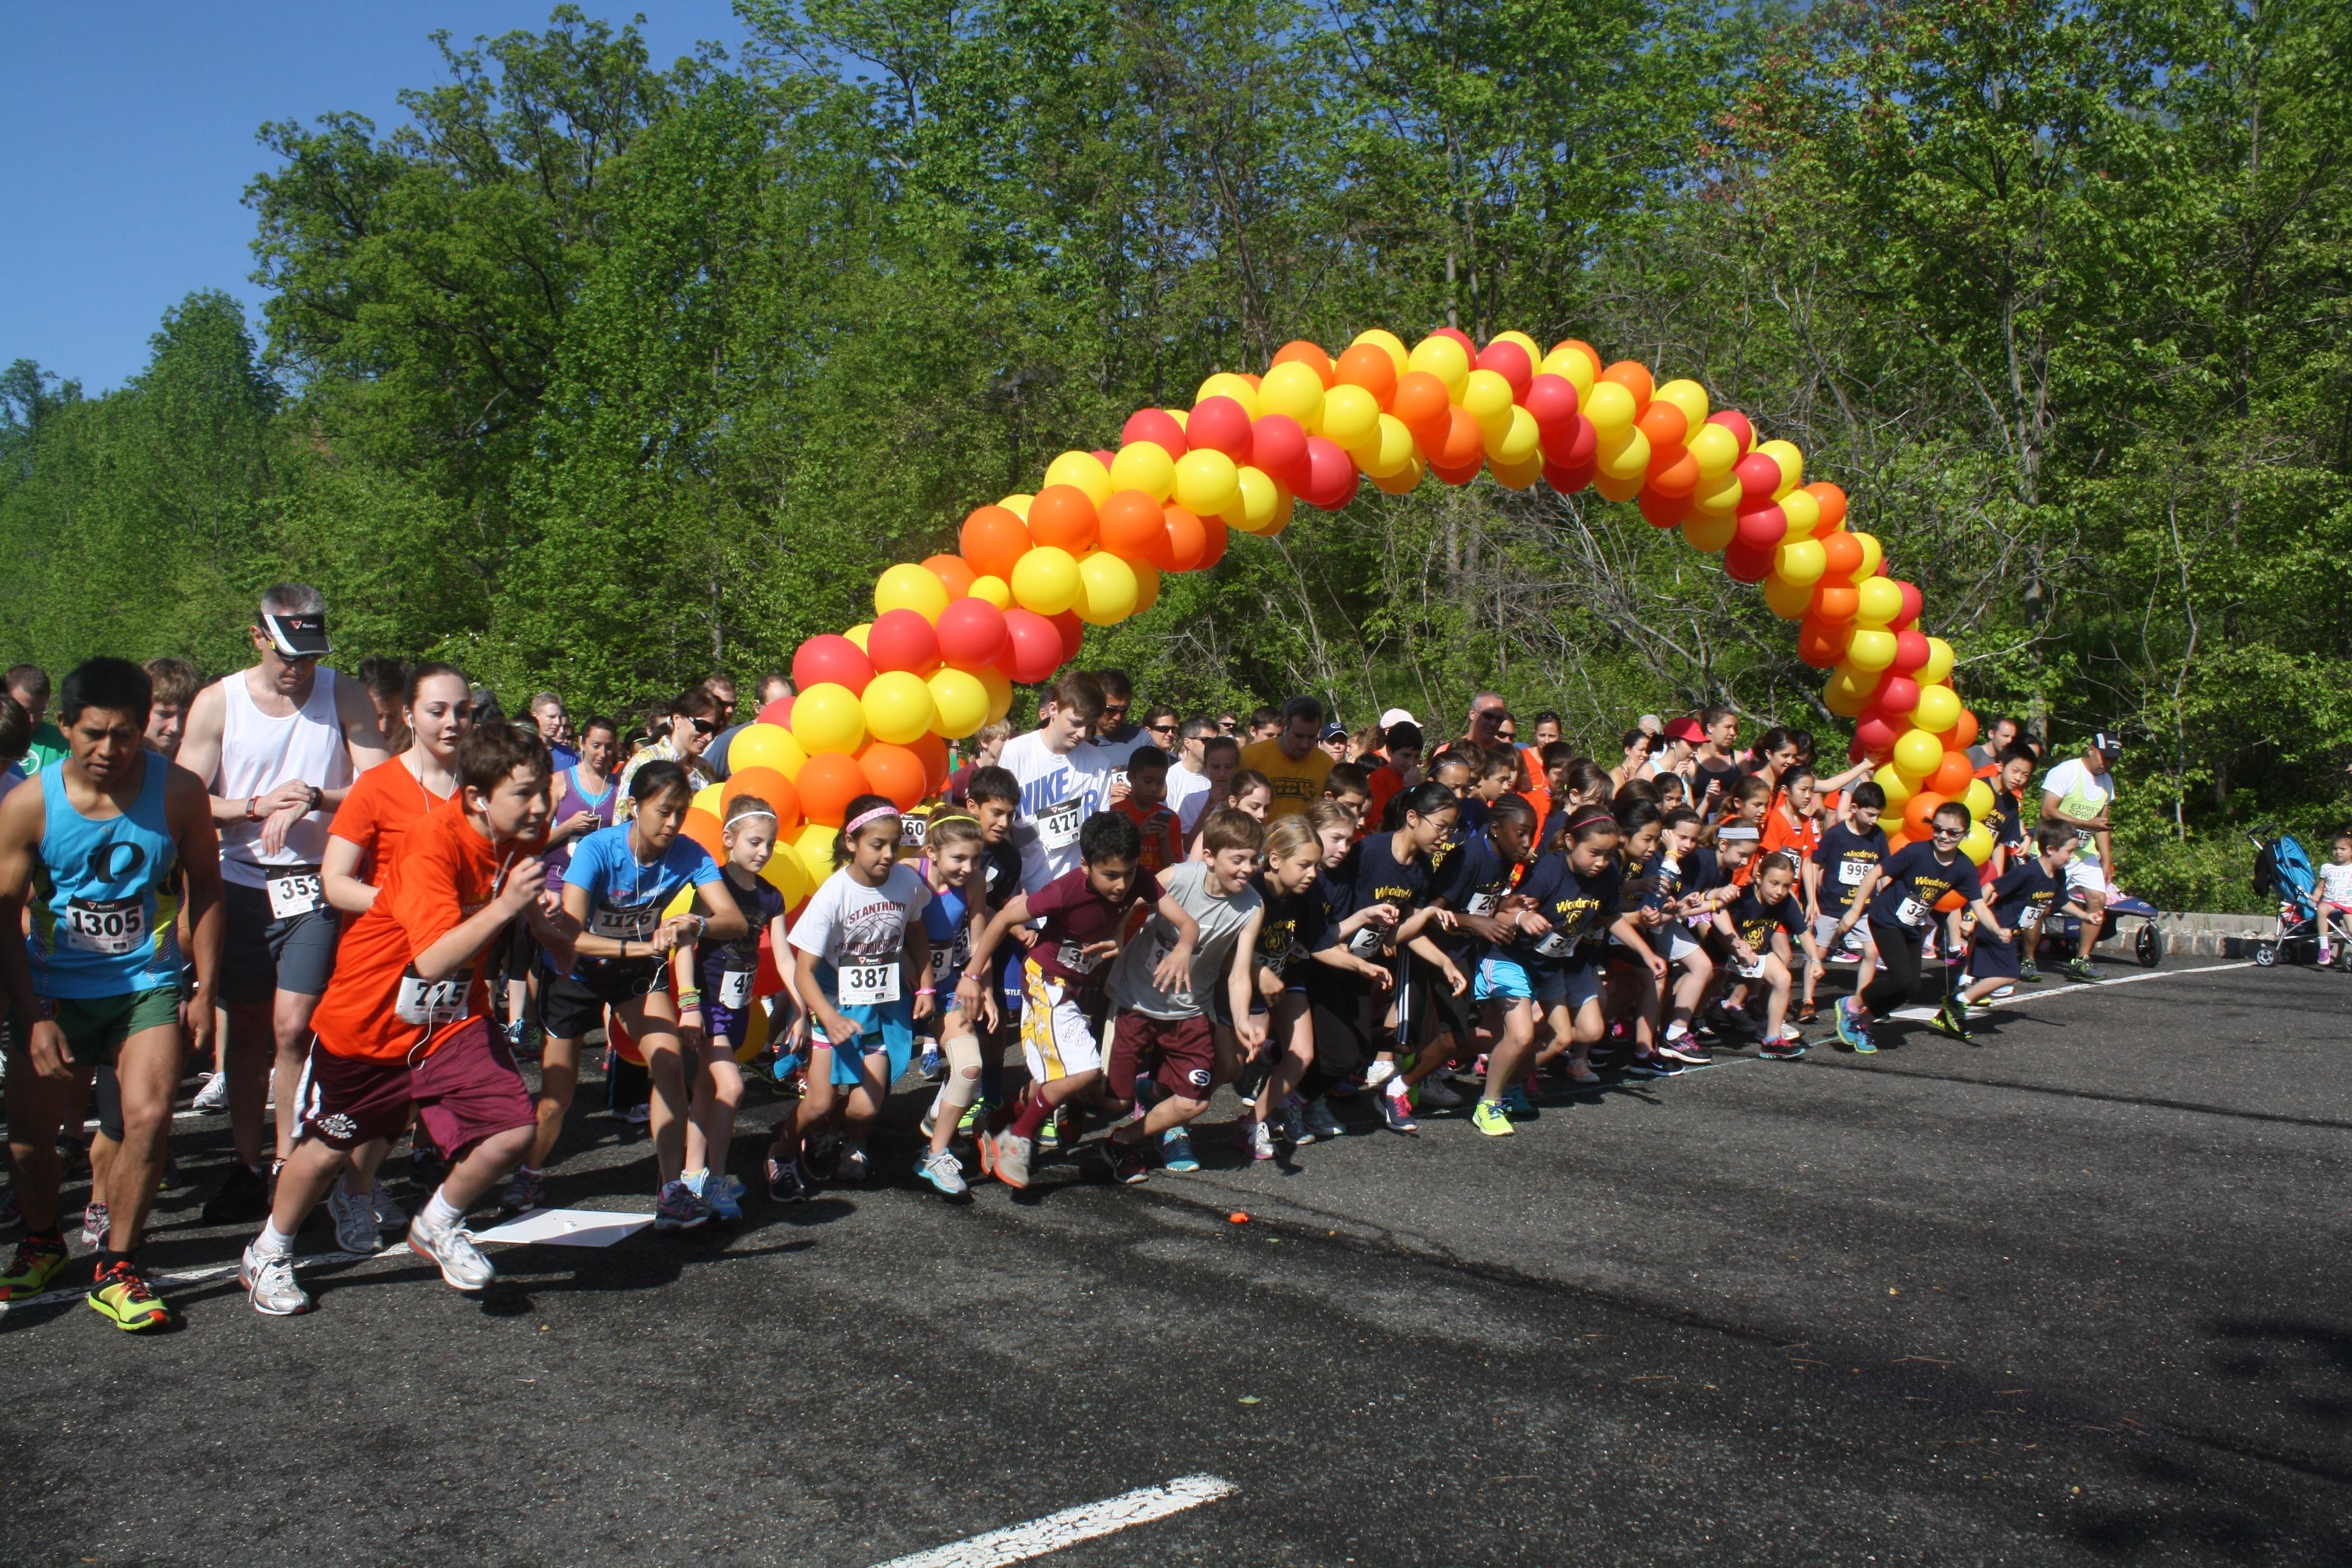 17580147b98e7af03649_MD5K_Runners_at_the_Start.JPG